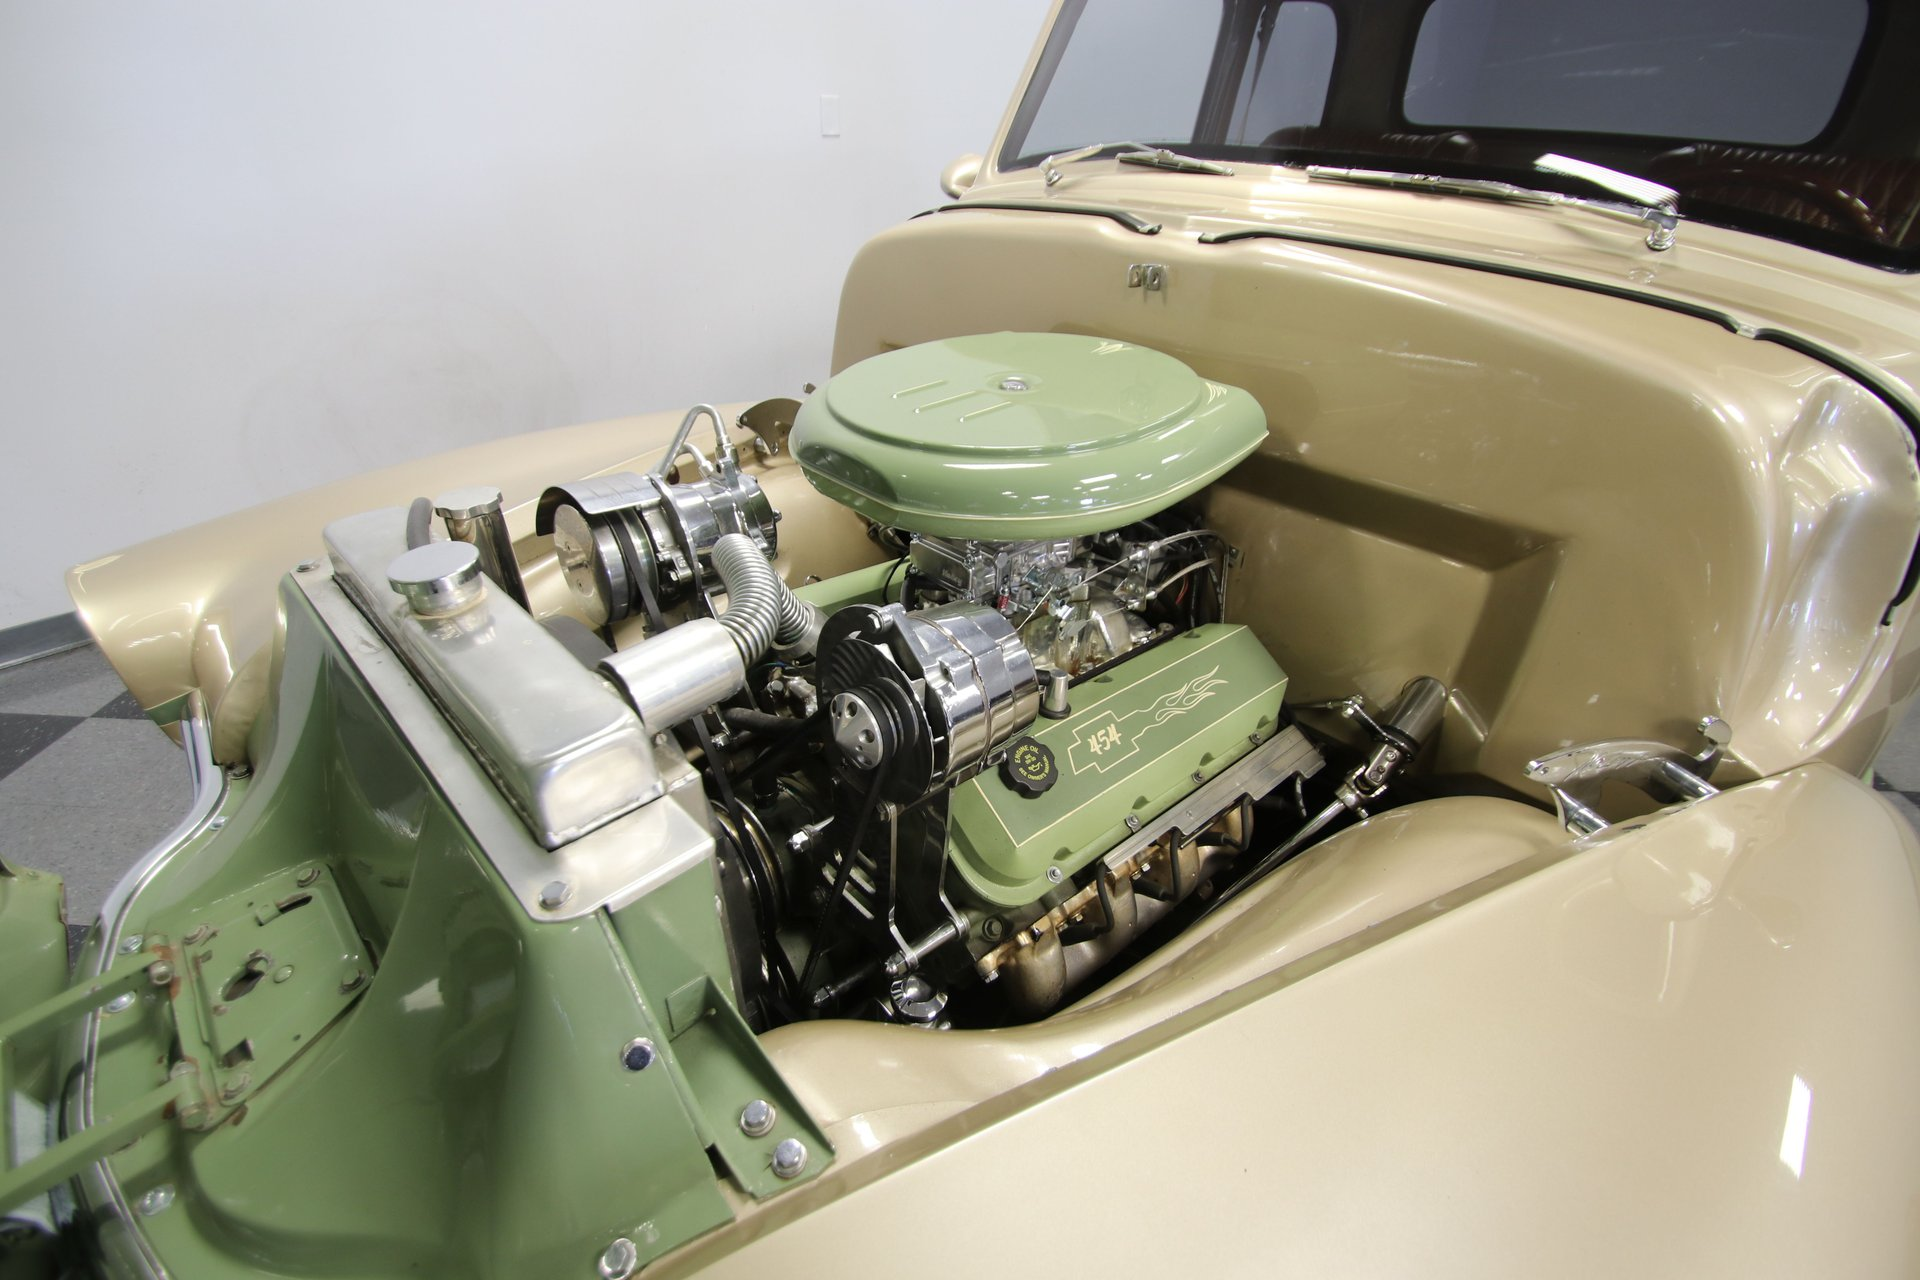 1948 chevrolet 3100 5 window restomod